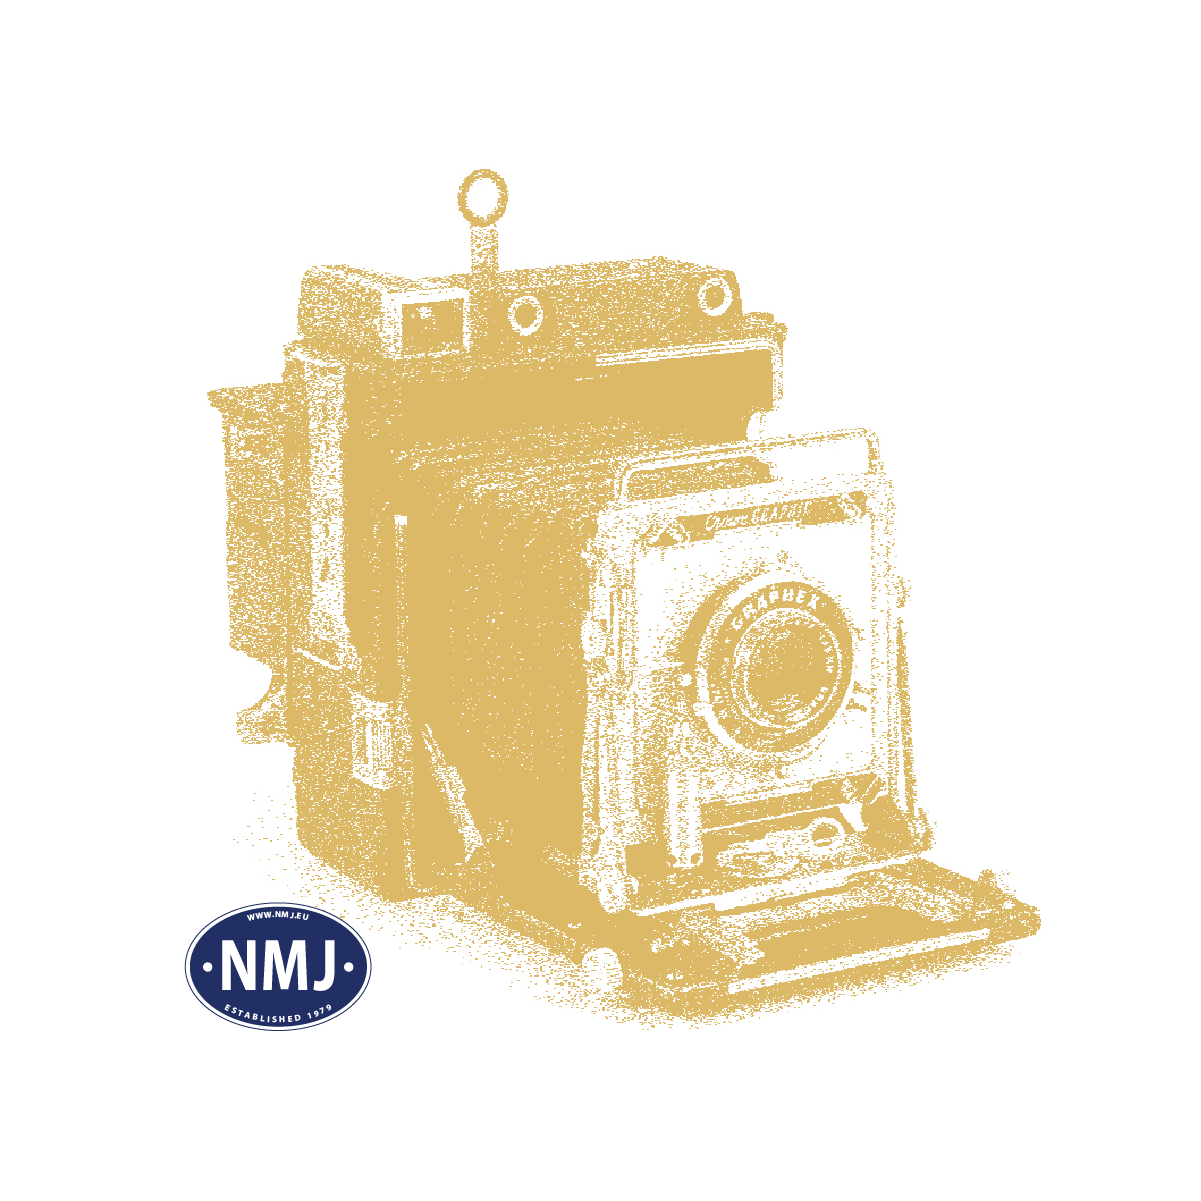 NMJT134.102 - NMJ Topline NSB DF37 21306, rotbraun (Gammeldesign)